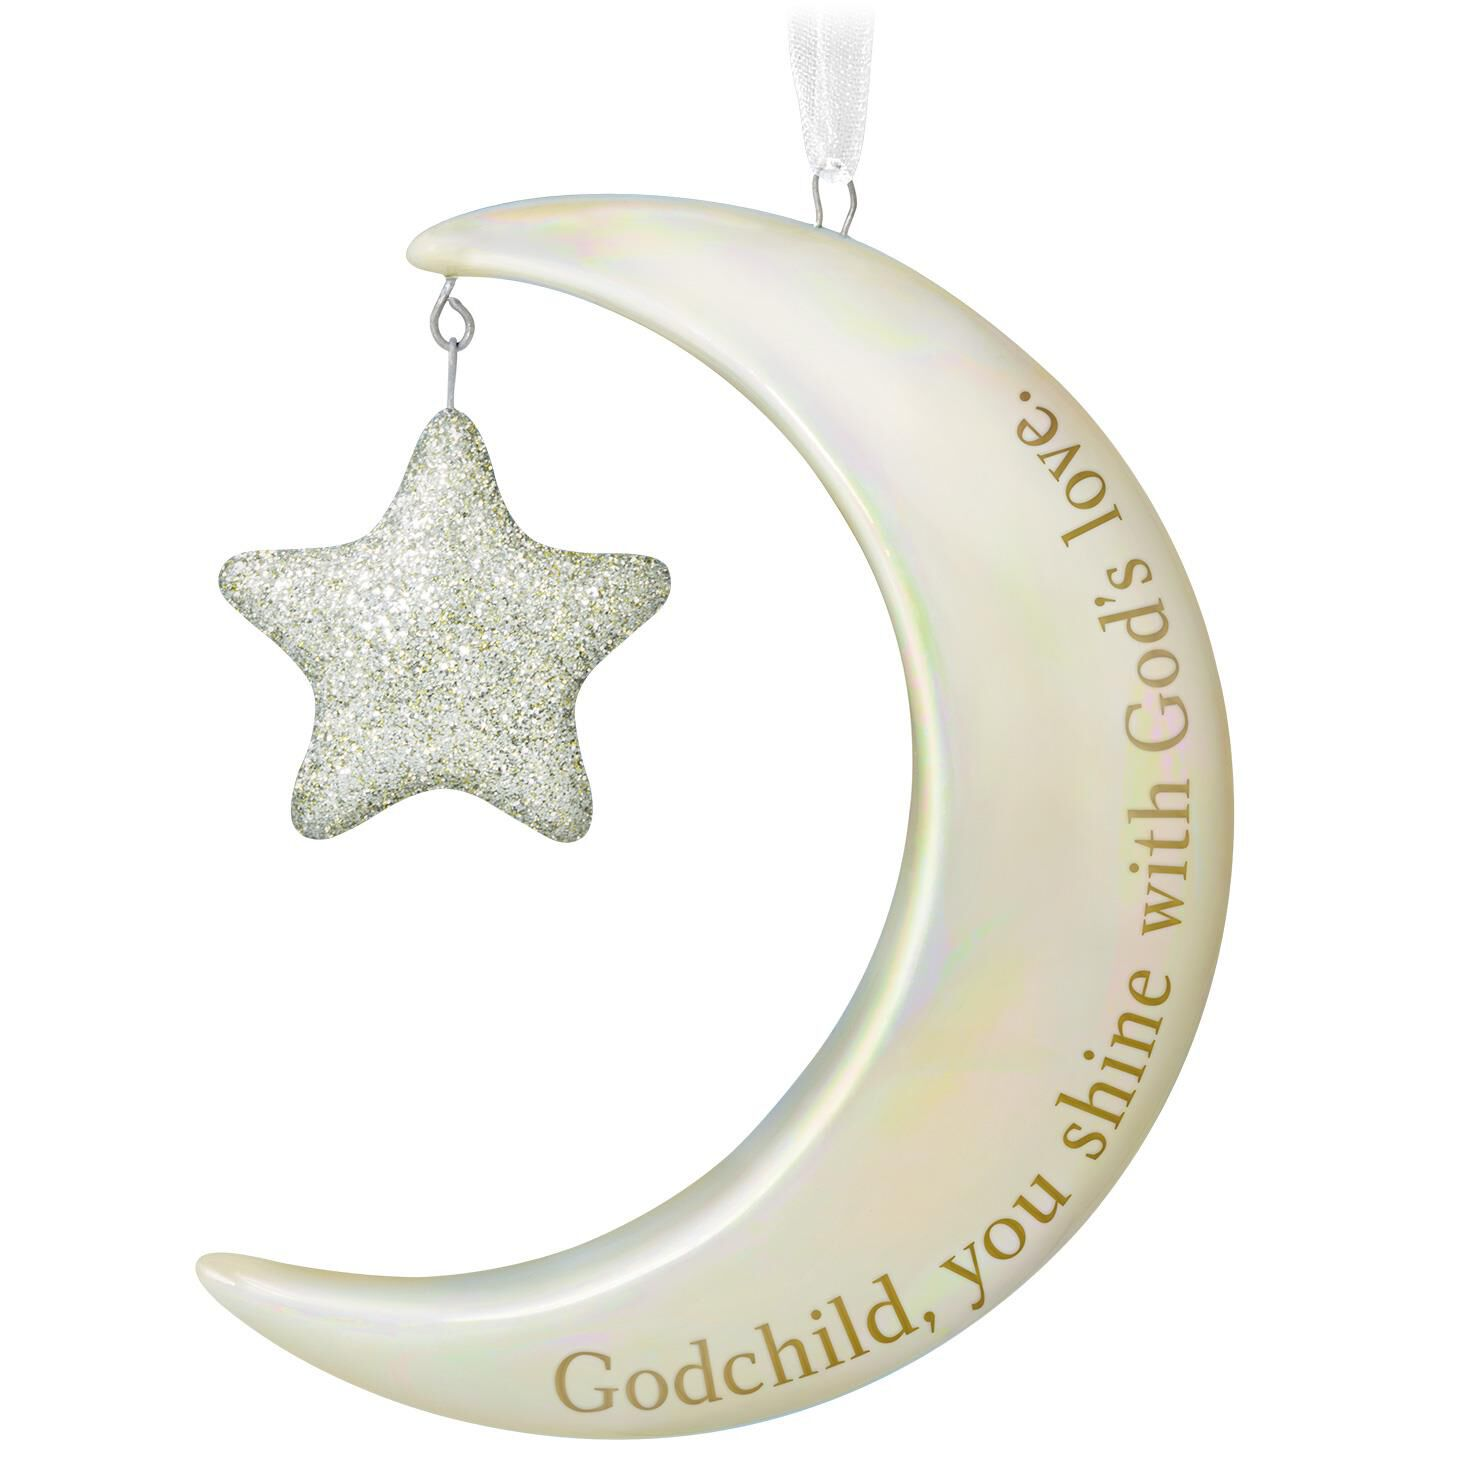 Godchild You Shine Moon and Stars Ornament  Keepsake Ornaments